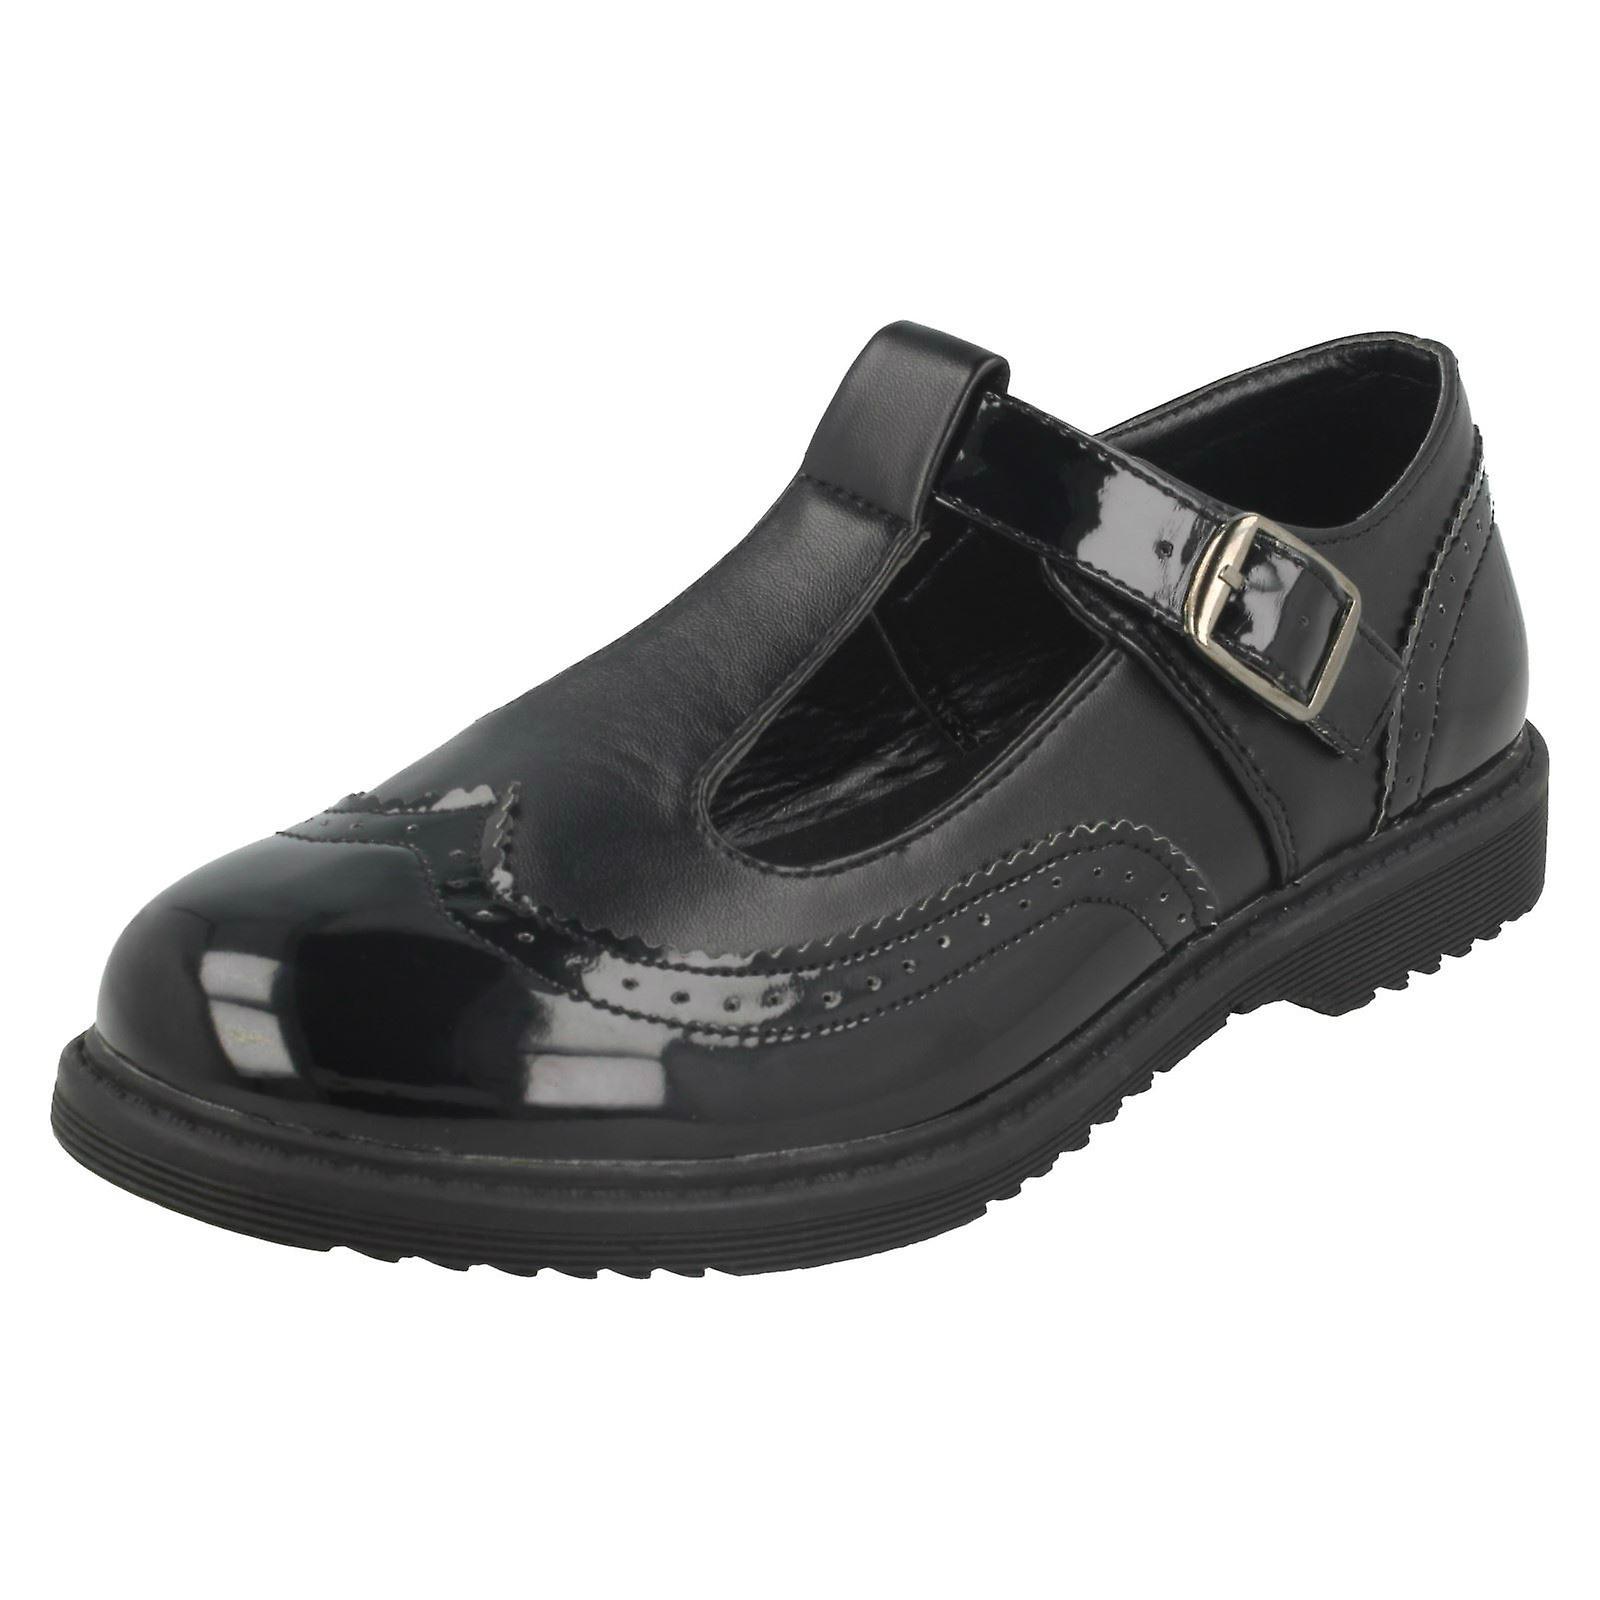 Girls Cool For School T Bar Brogue School Shoes H2435